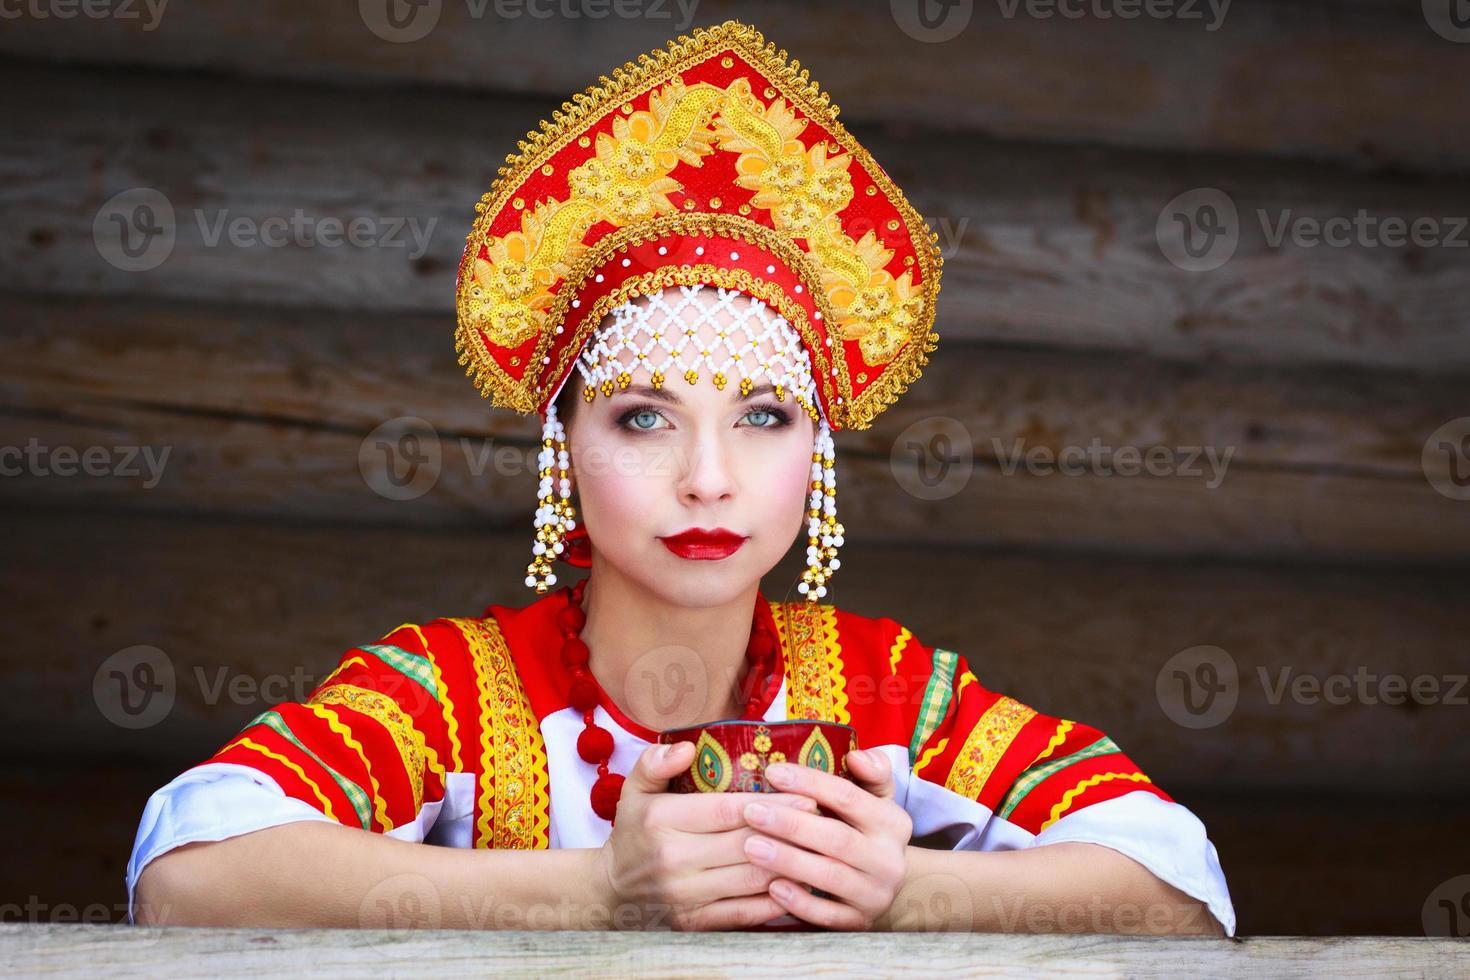 Russisch meisje in een kokoshnik foto